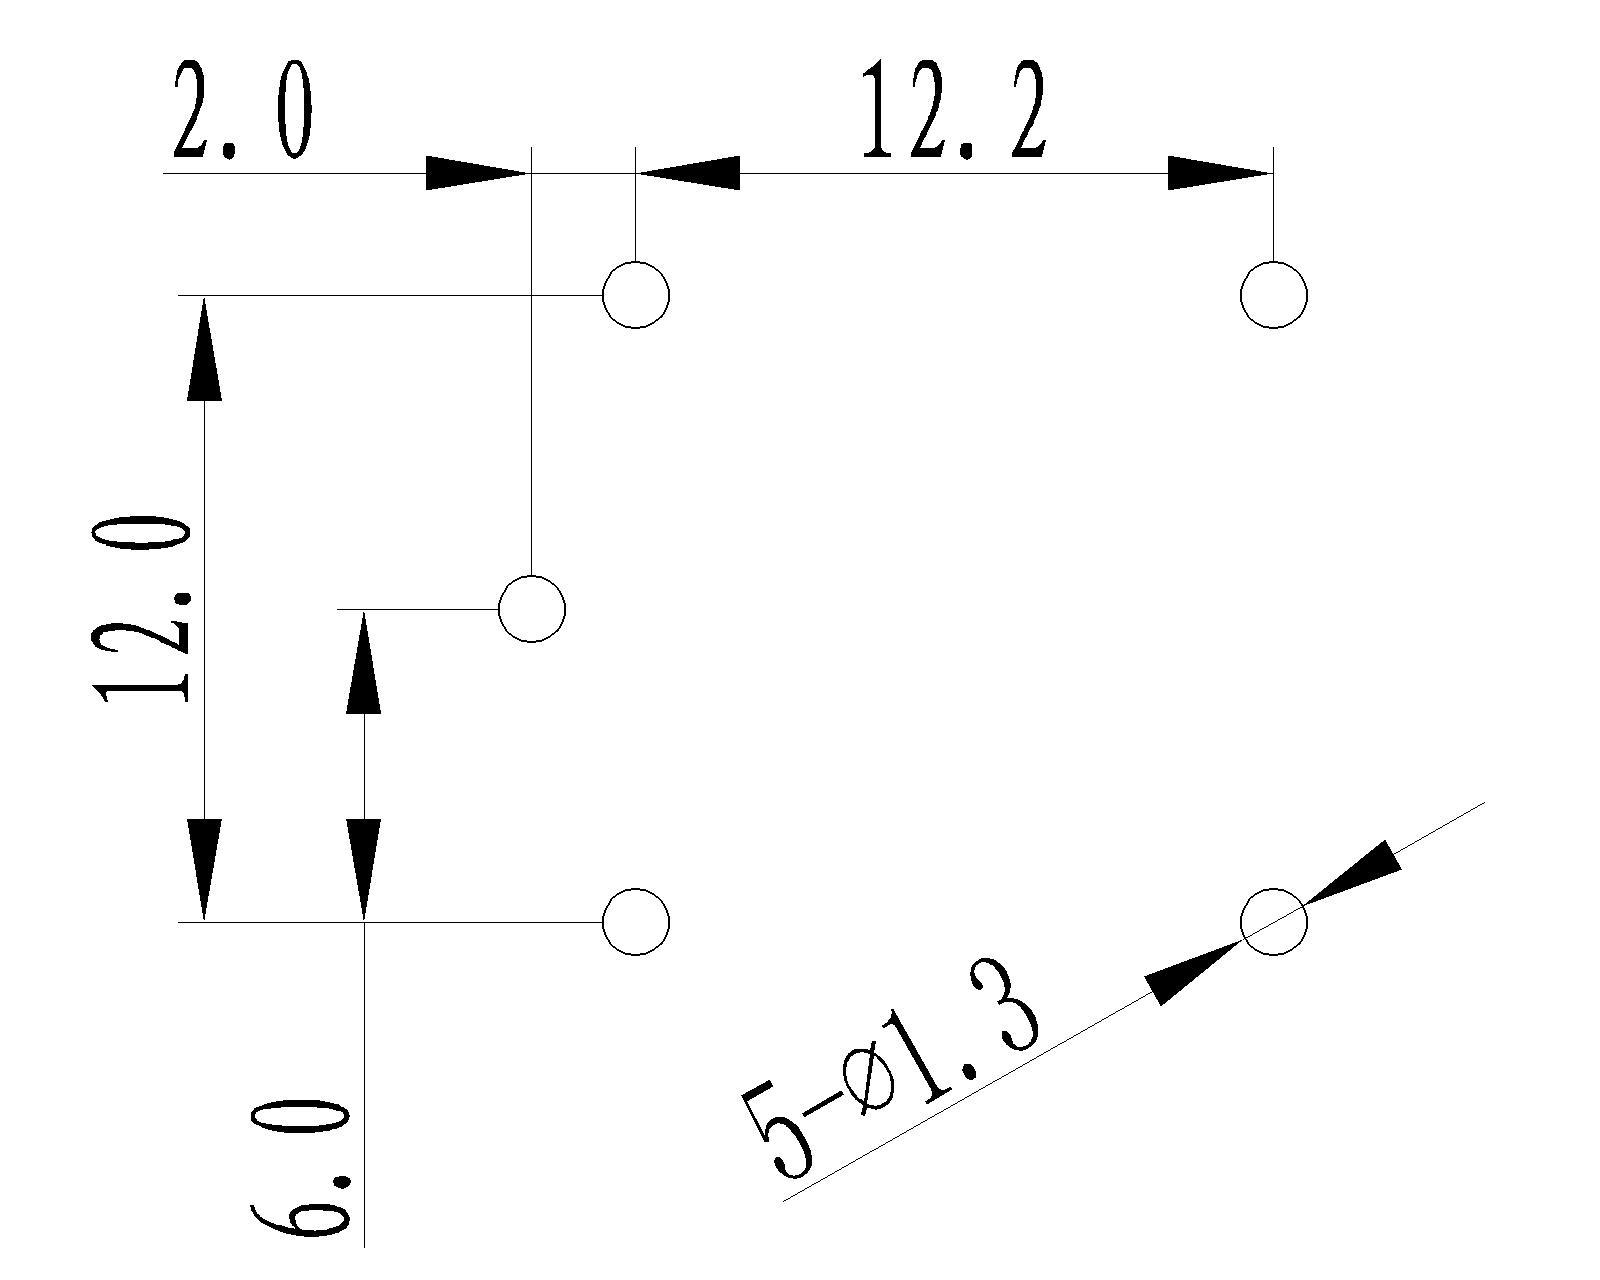 922-H pcb layout